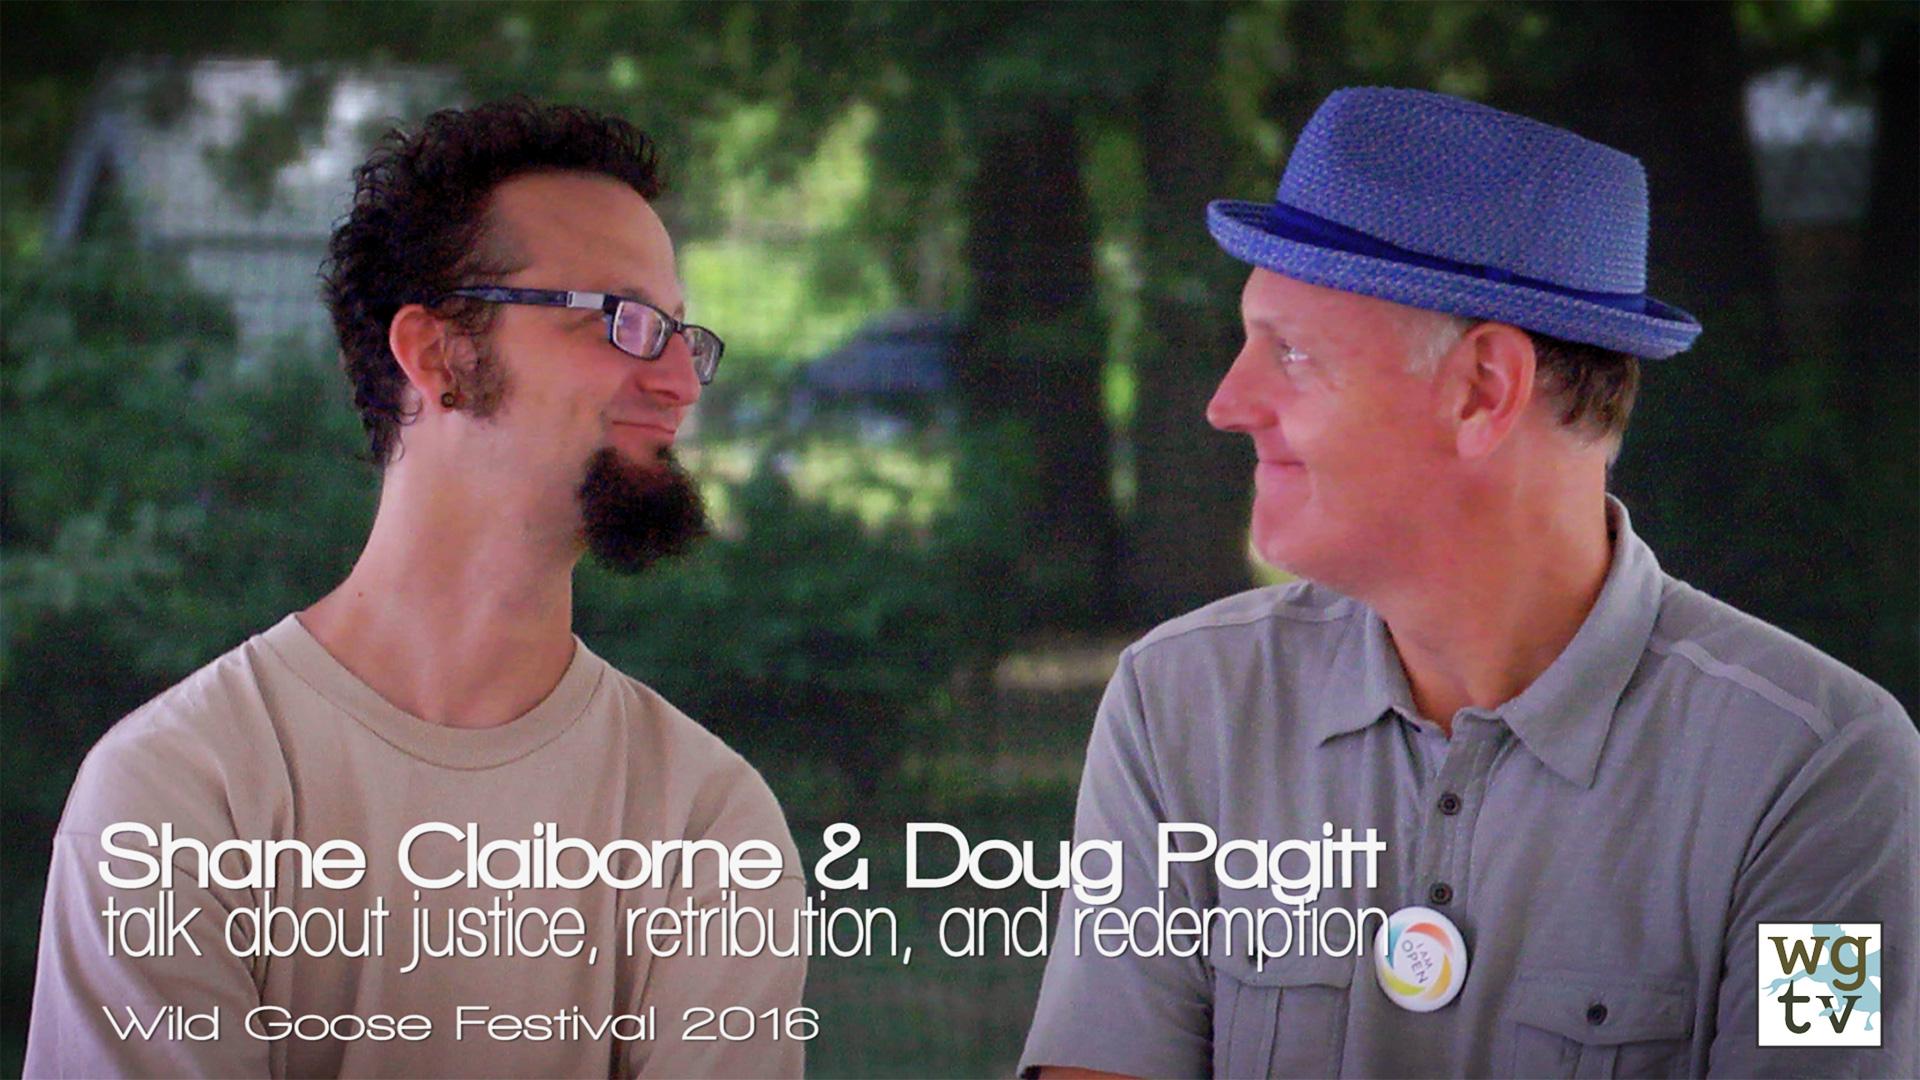 Shane Claiborne and Doug Pagitt